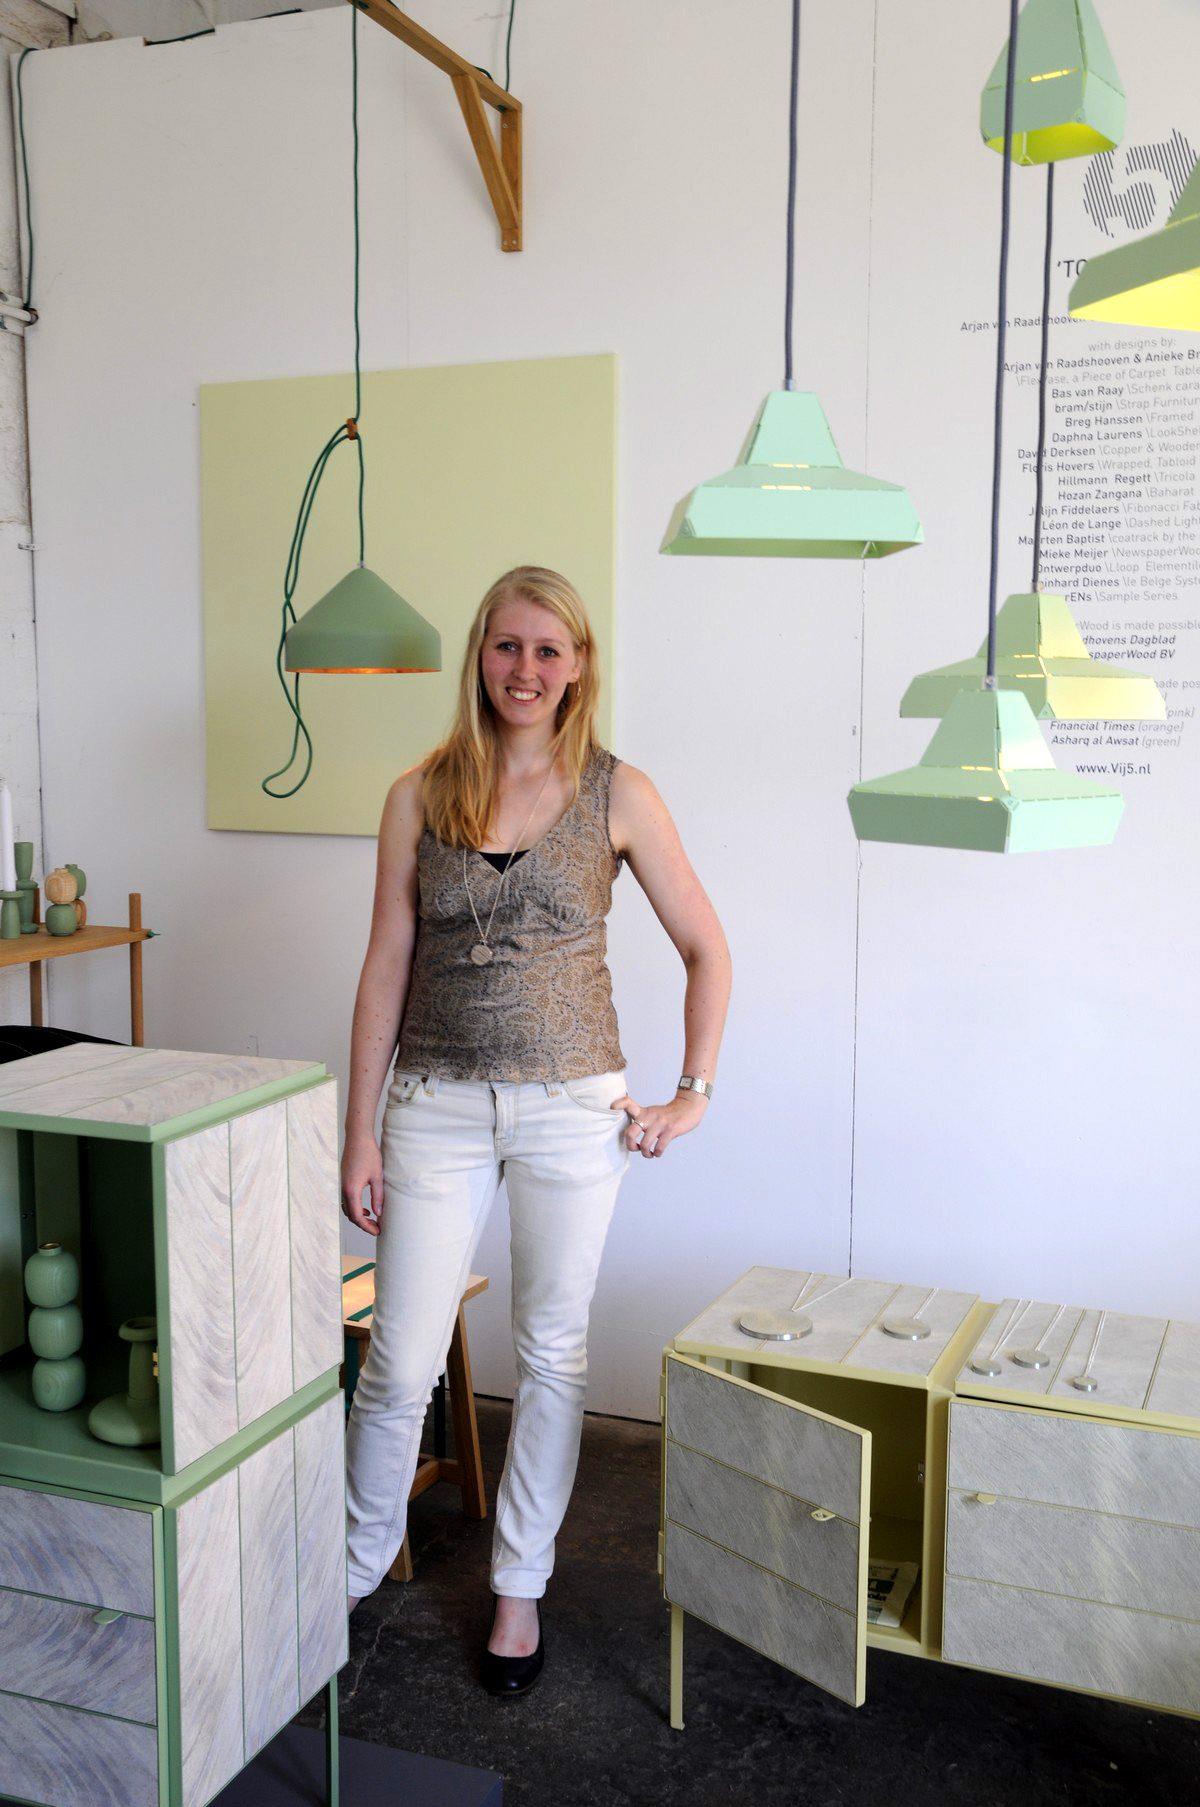 Vij5 Anieke Branderhorst met Dashed Lights en Lloop lamp groen in Milaan_Foto Gimmii